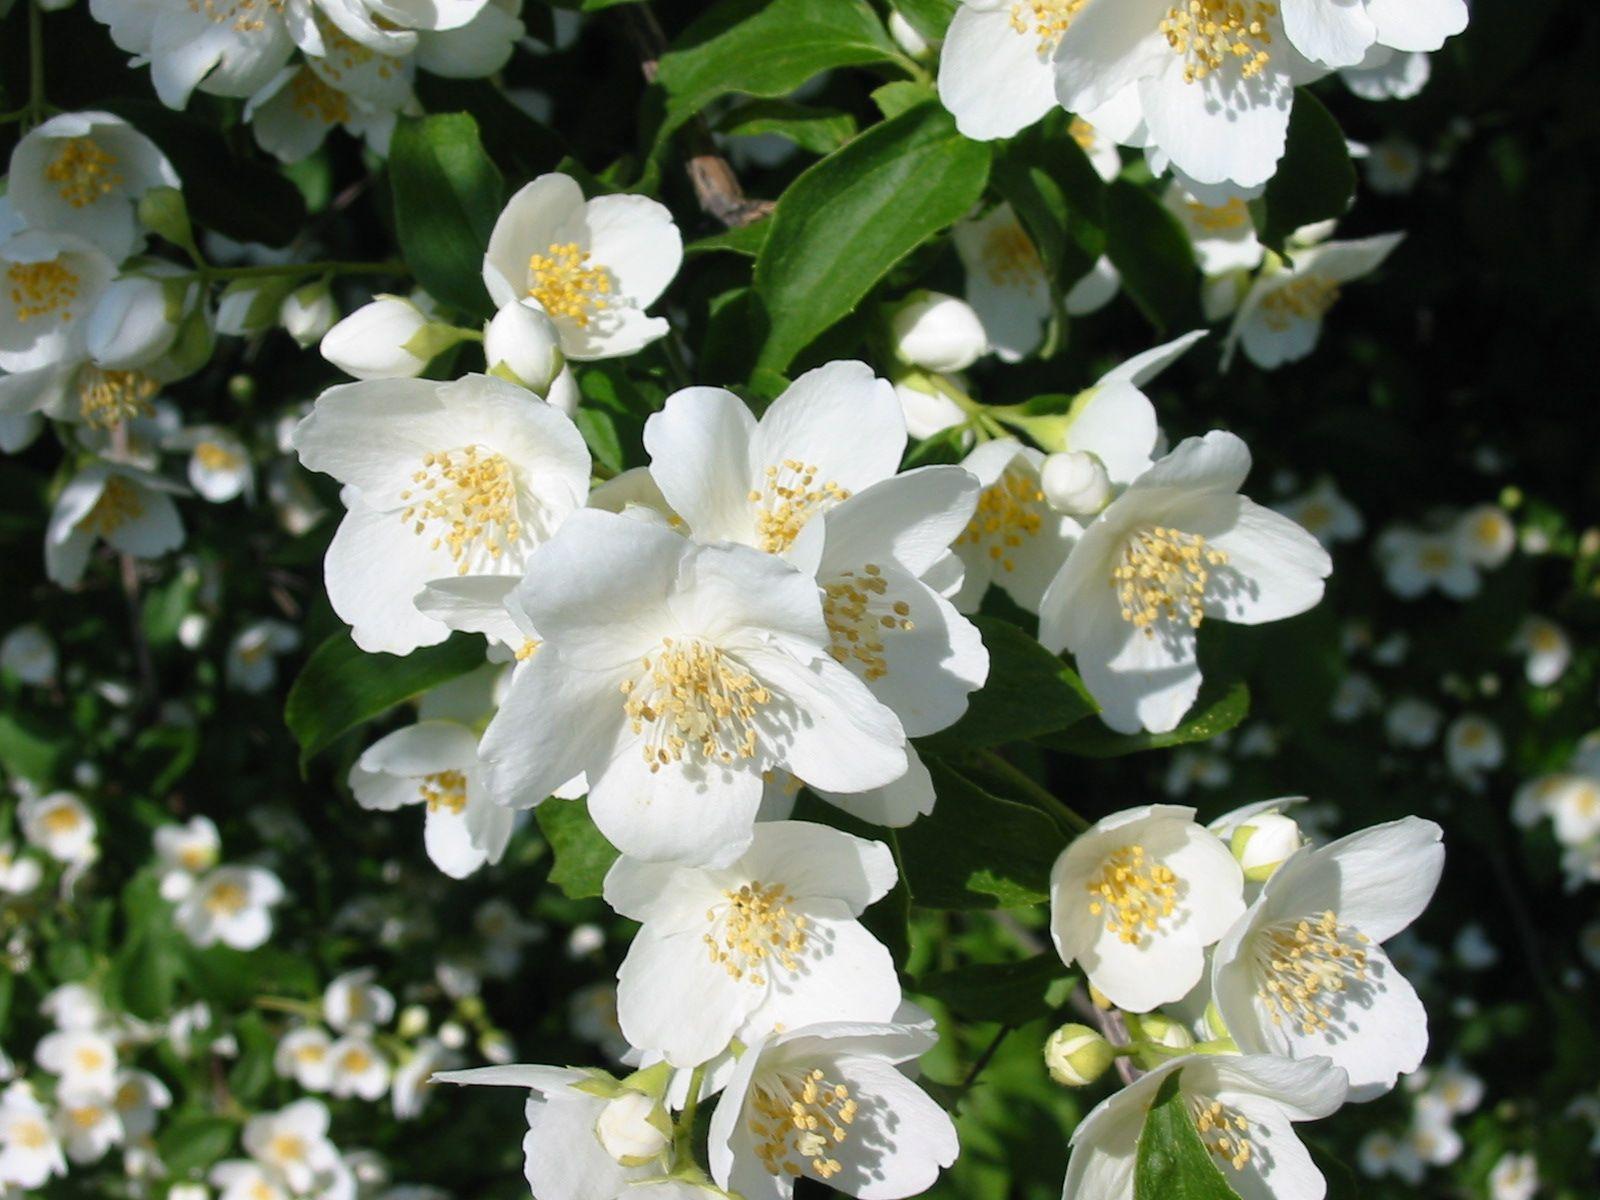 Jasmine flower romantic flowers jasmine flowers lovely flowers wild food and recipes uk any flower syrup recipes mightylinksfo